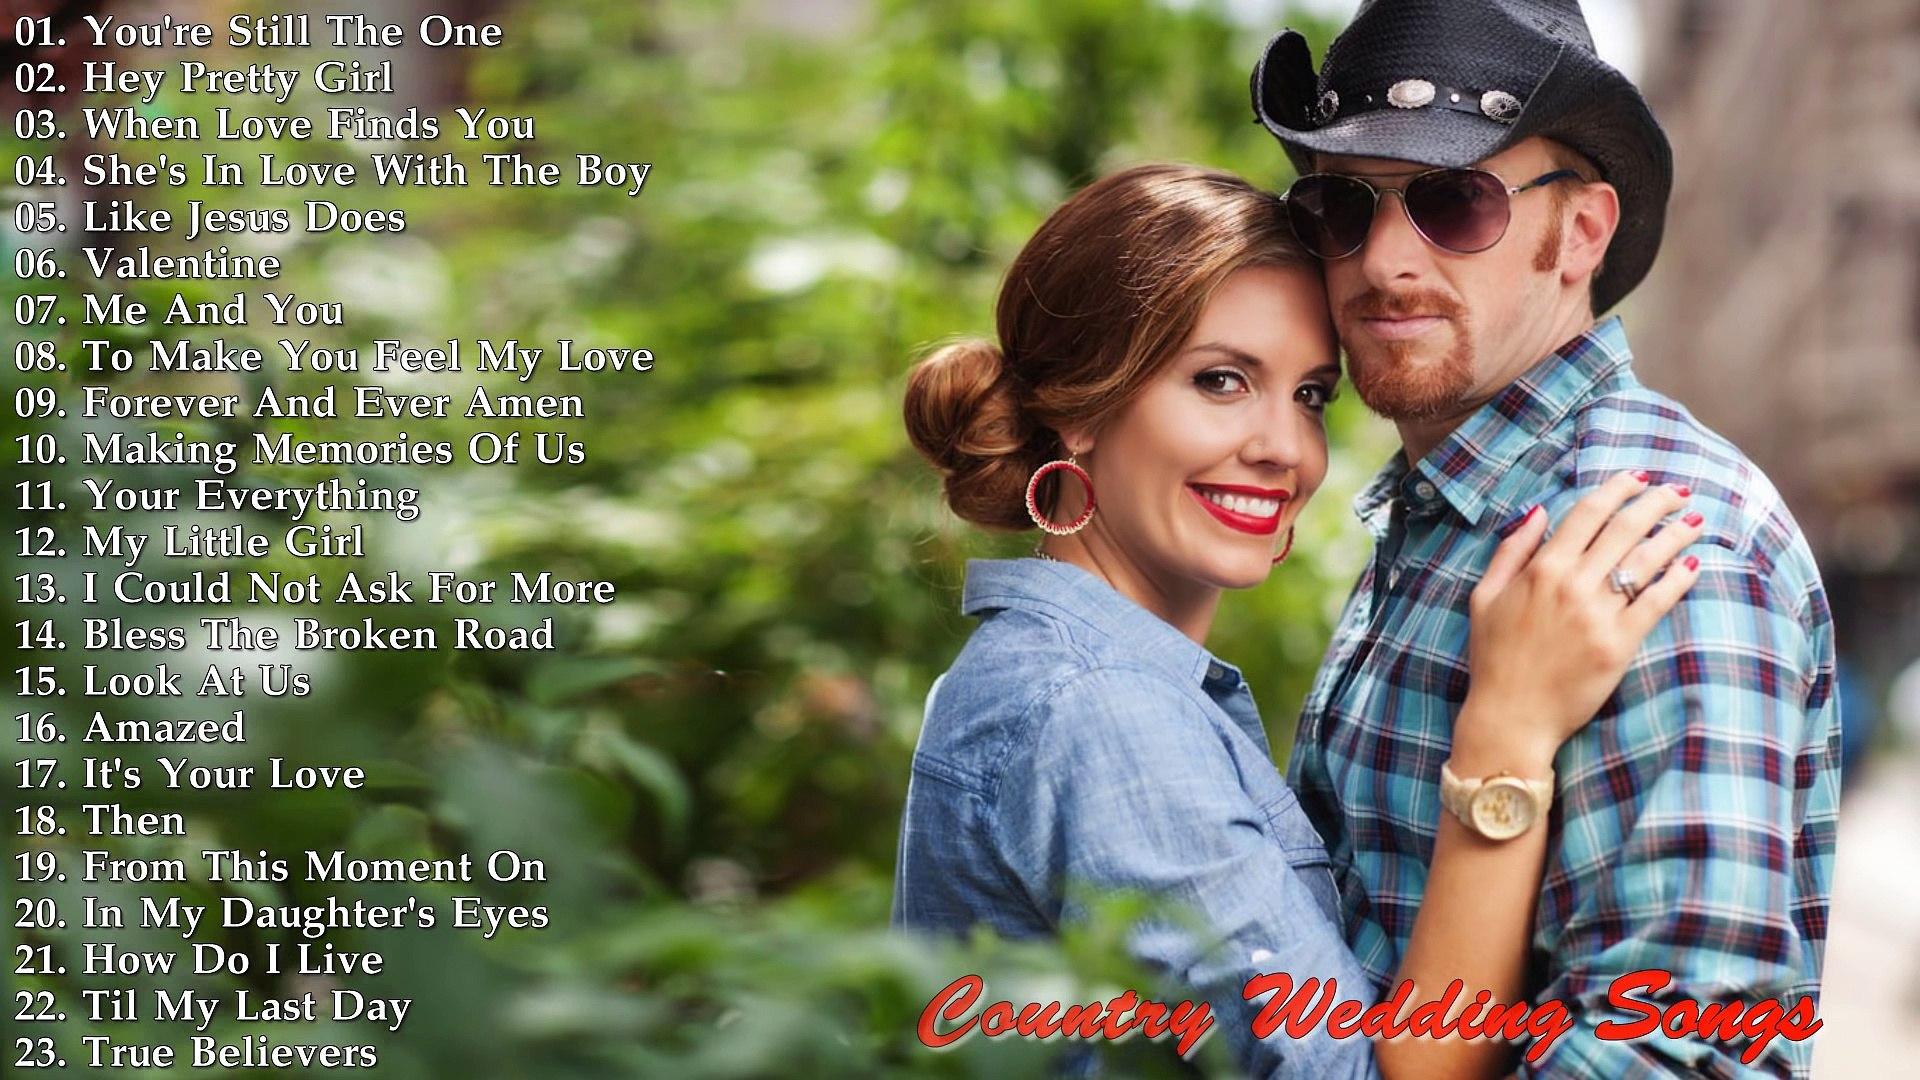 Top 30 Songs Country Love Songs -- Country Wedding Songs